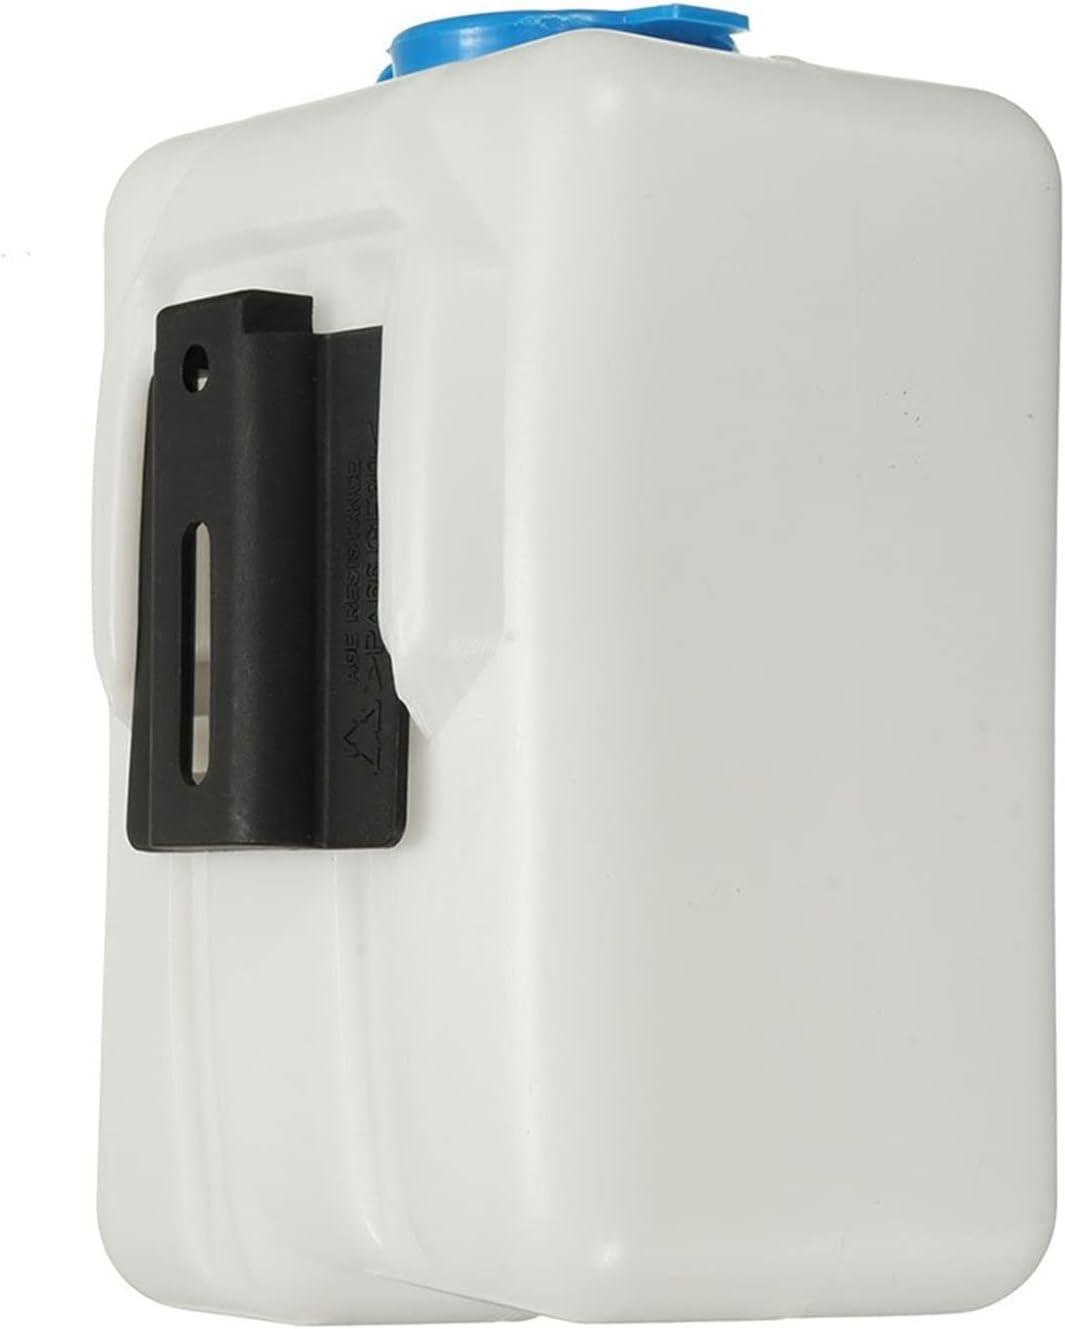 XUEMEI Universal Washer Bottle Superlatite Tank 12V Windshield Pump Kit 1.8L Max 63% OFF